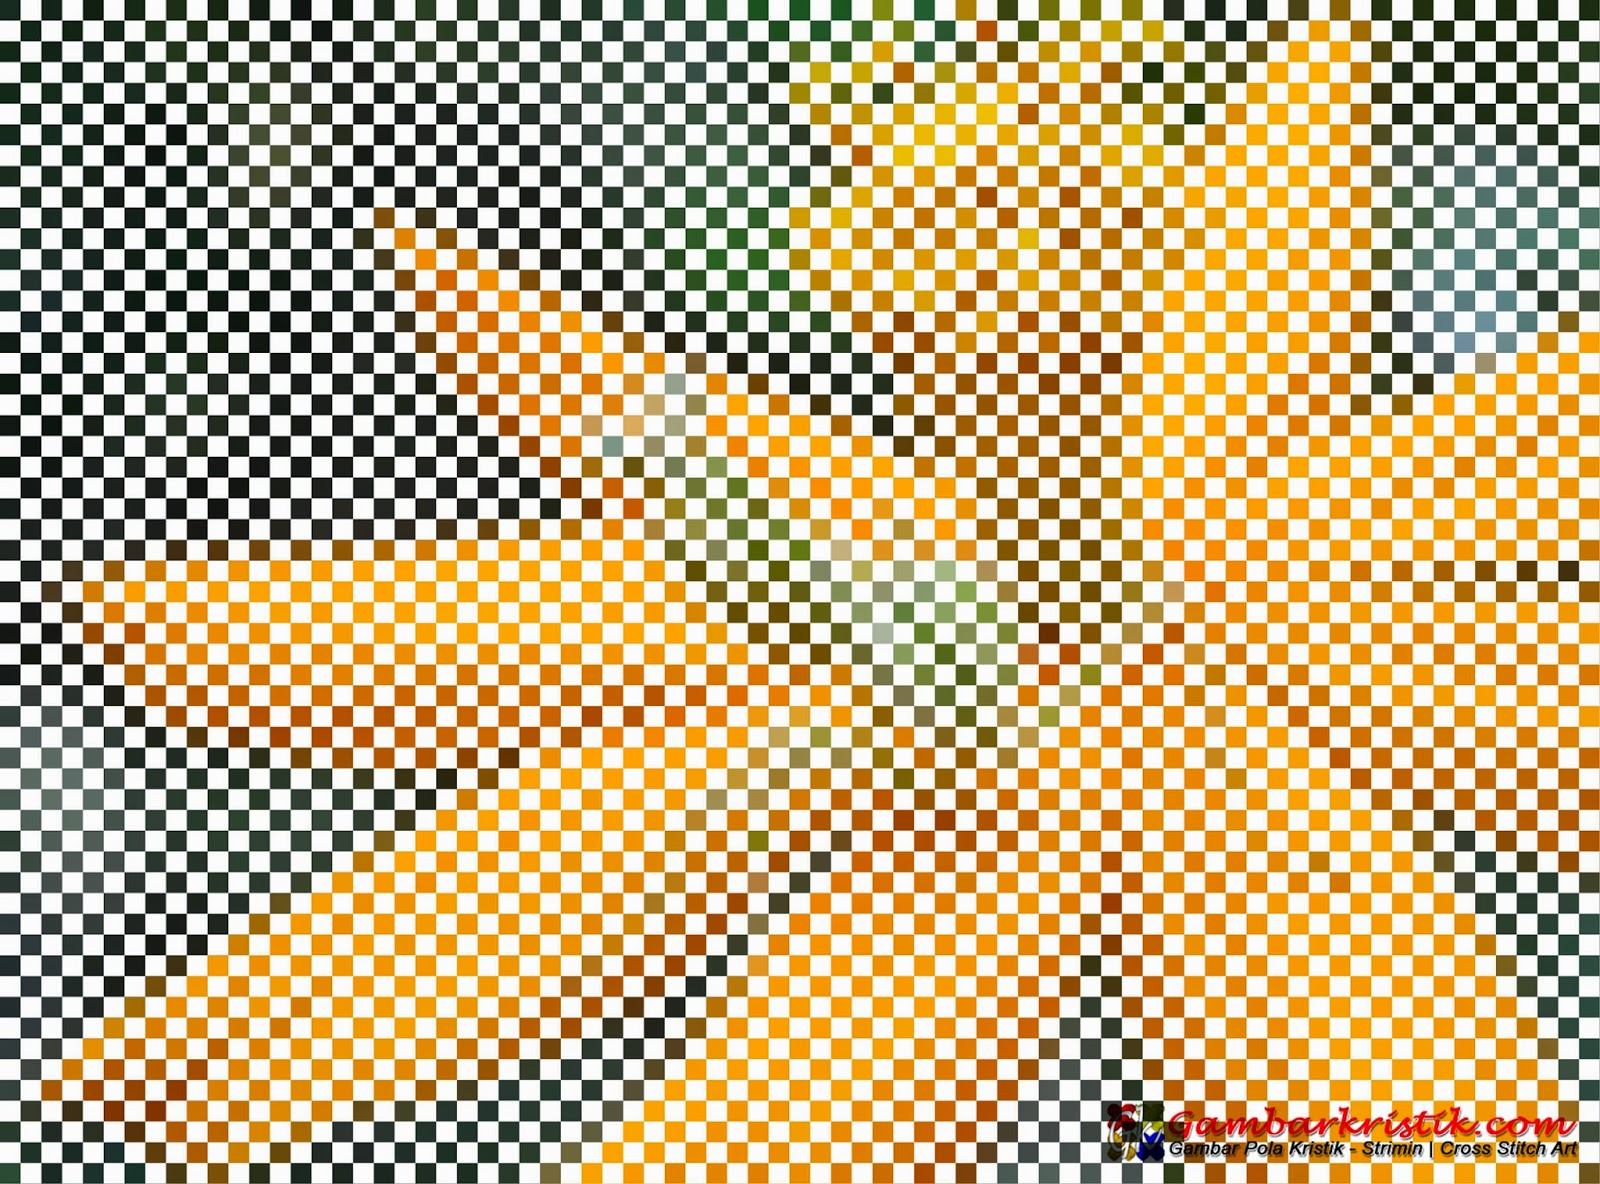 Gambar Anyaman Digital - Belalang di Bunga Kenikir Kuning